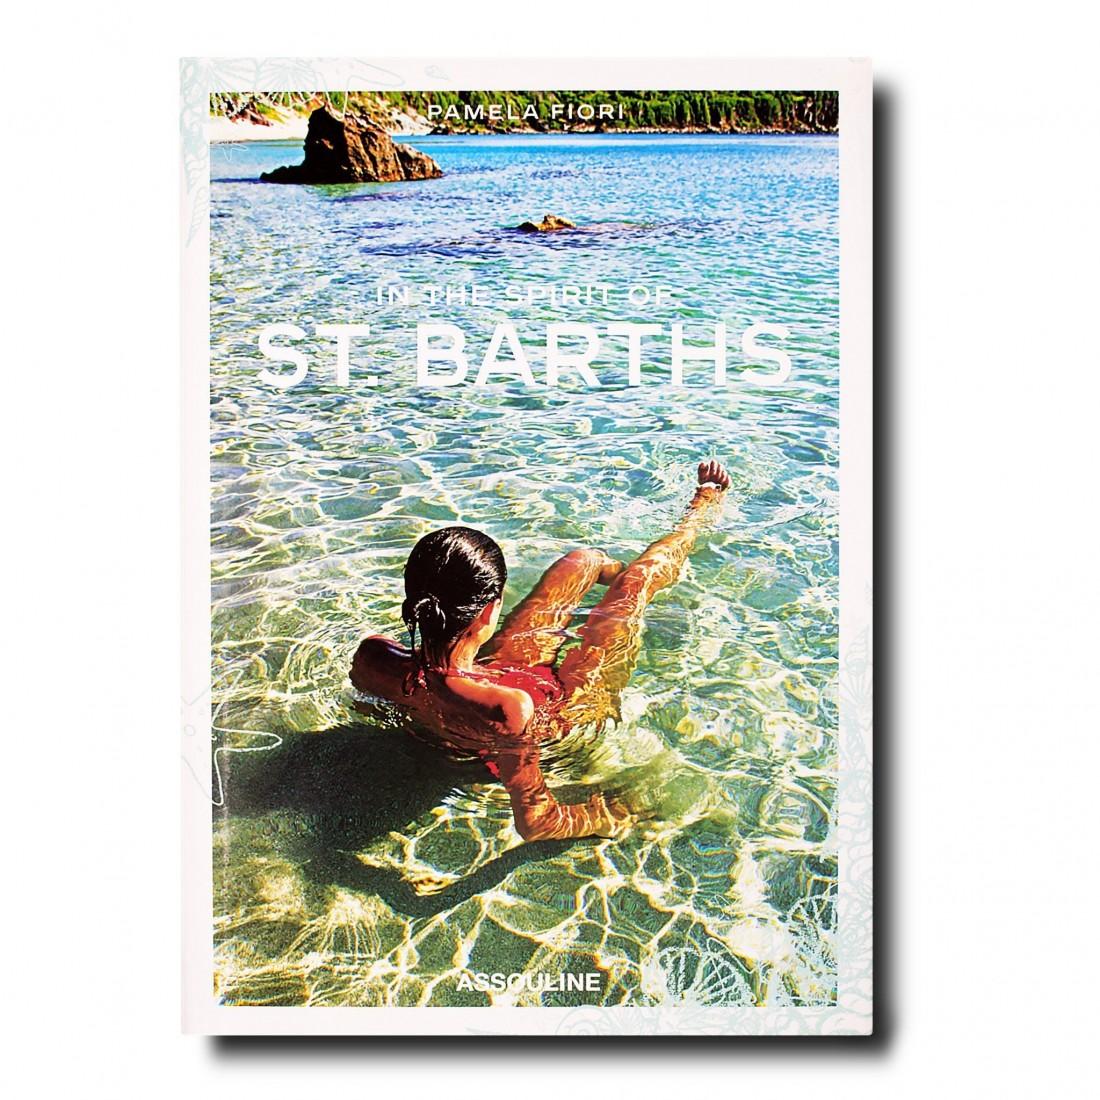 Livre In the Spirit of St. Barths Assouline